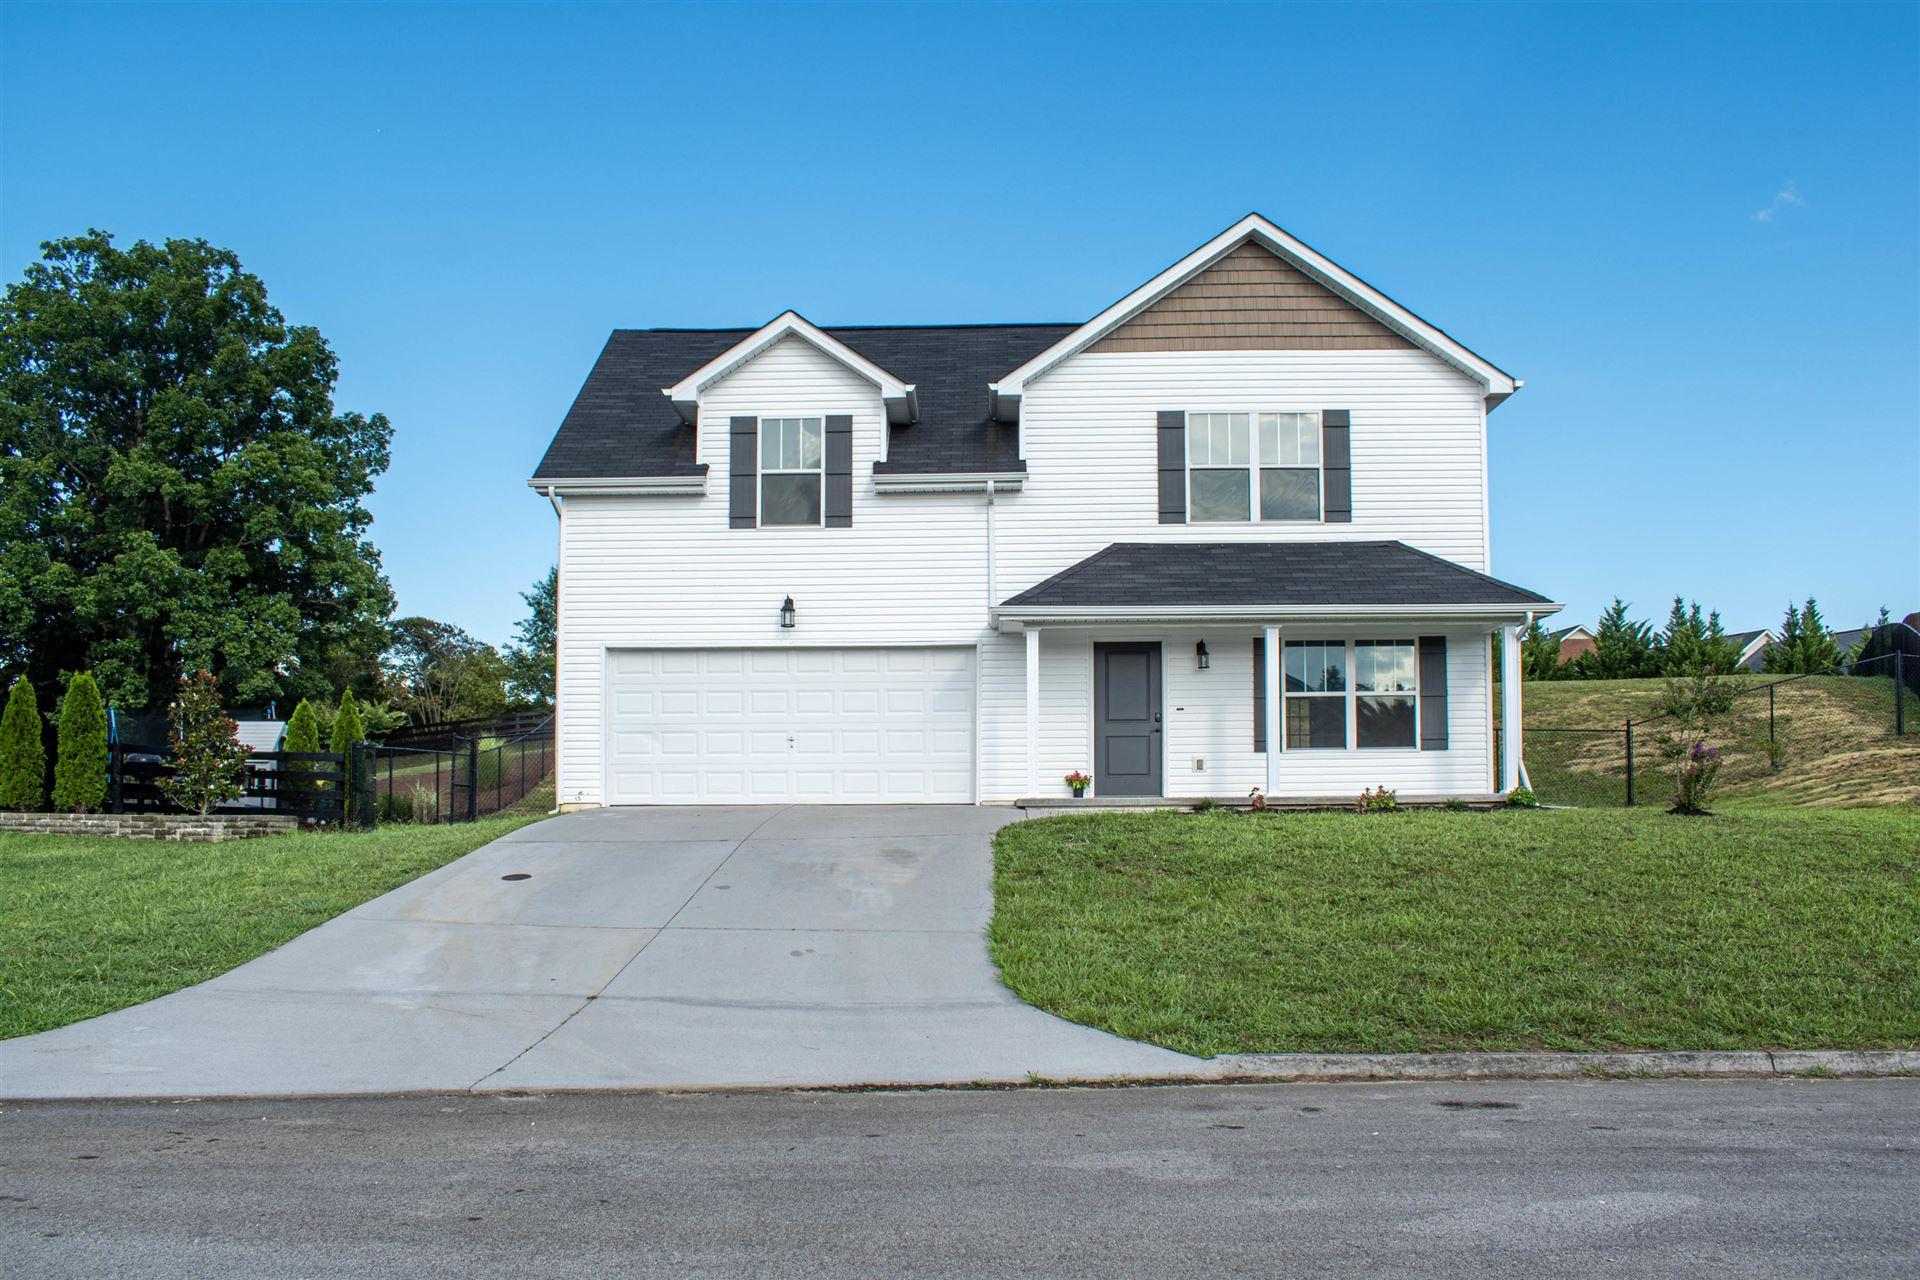 Photo of 1254 Quiet Brook Lane, Knoxville, TN 37914 (MLS # 1165215)